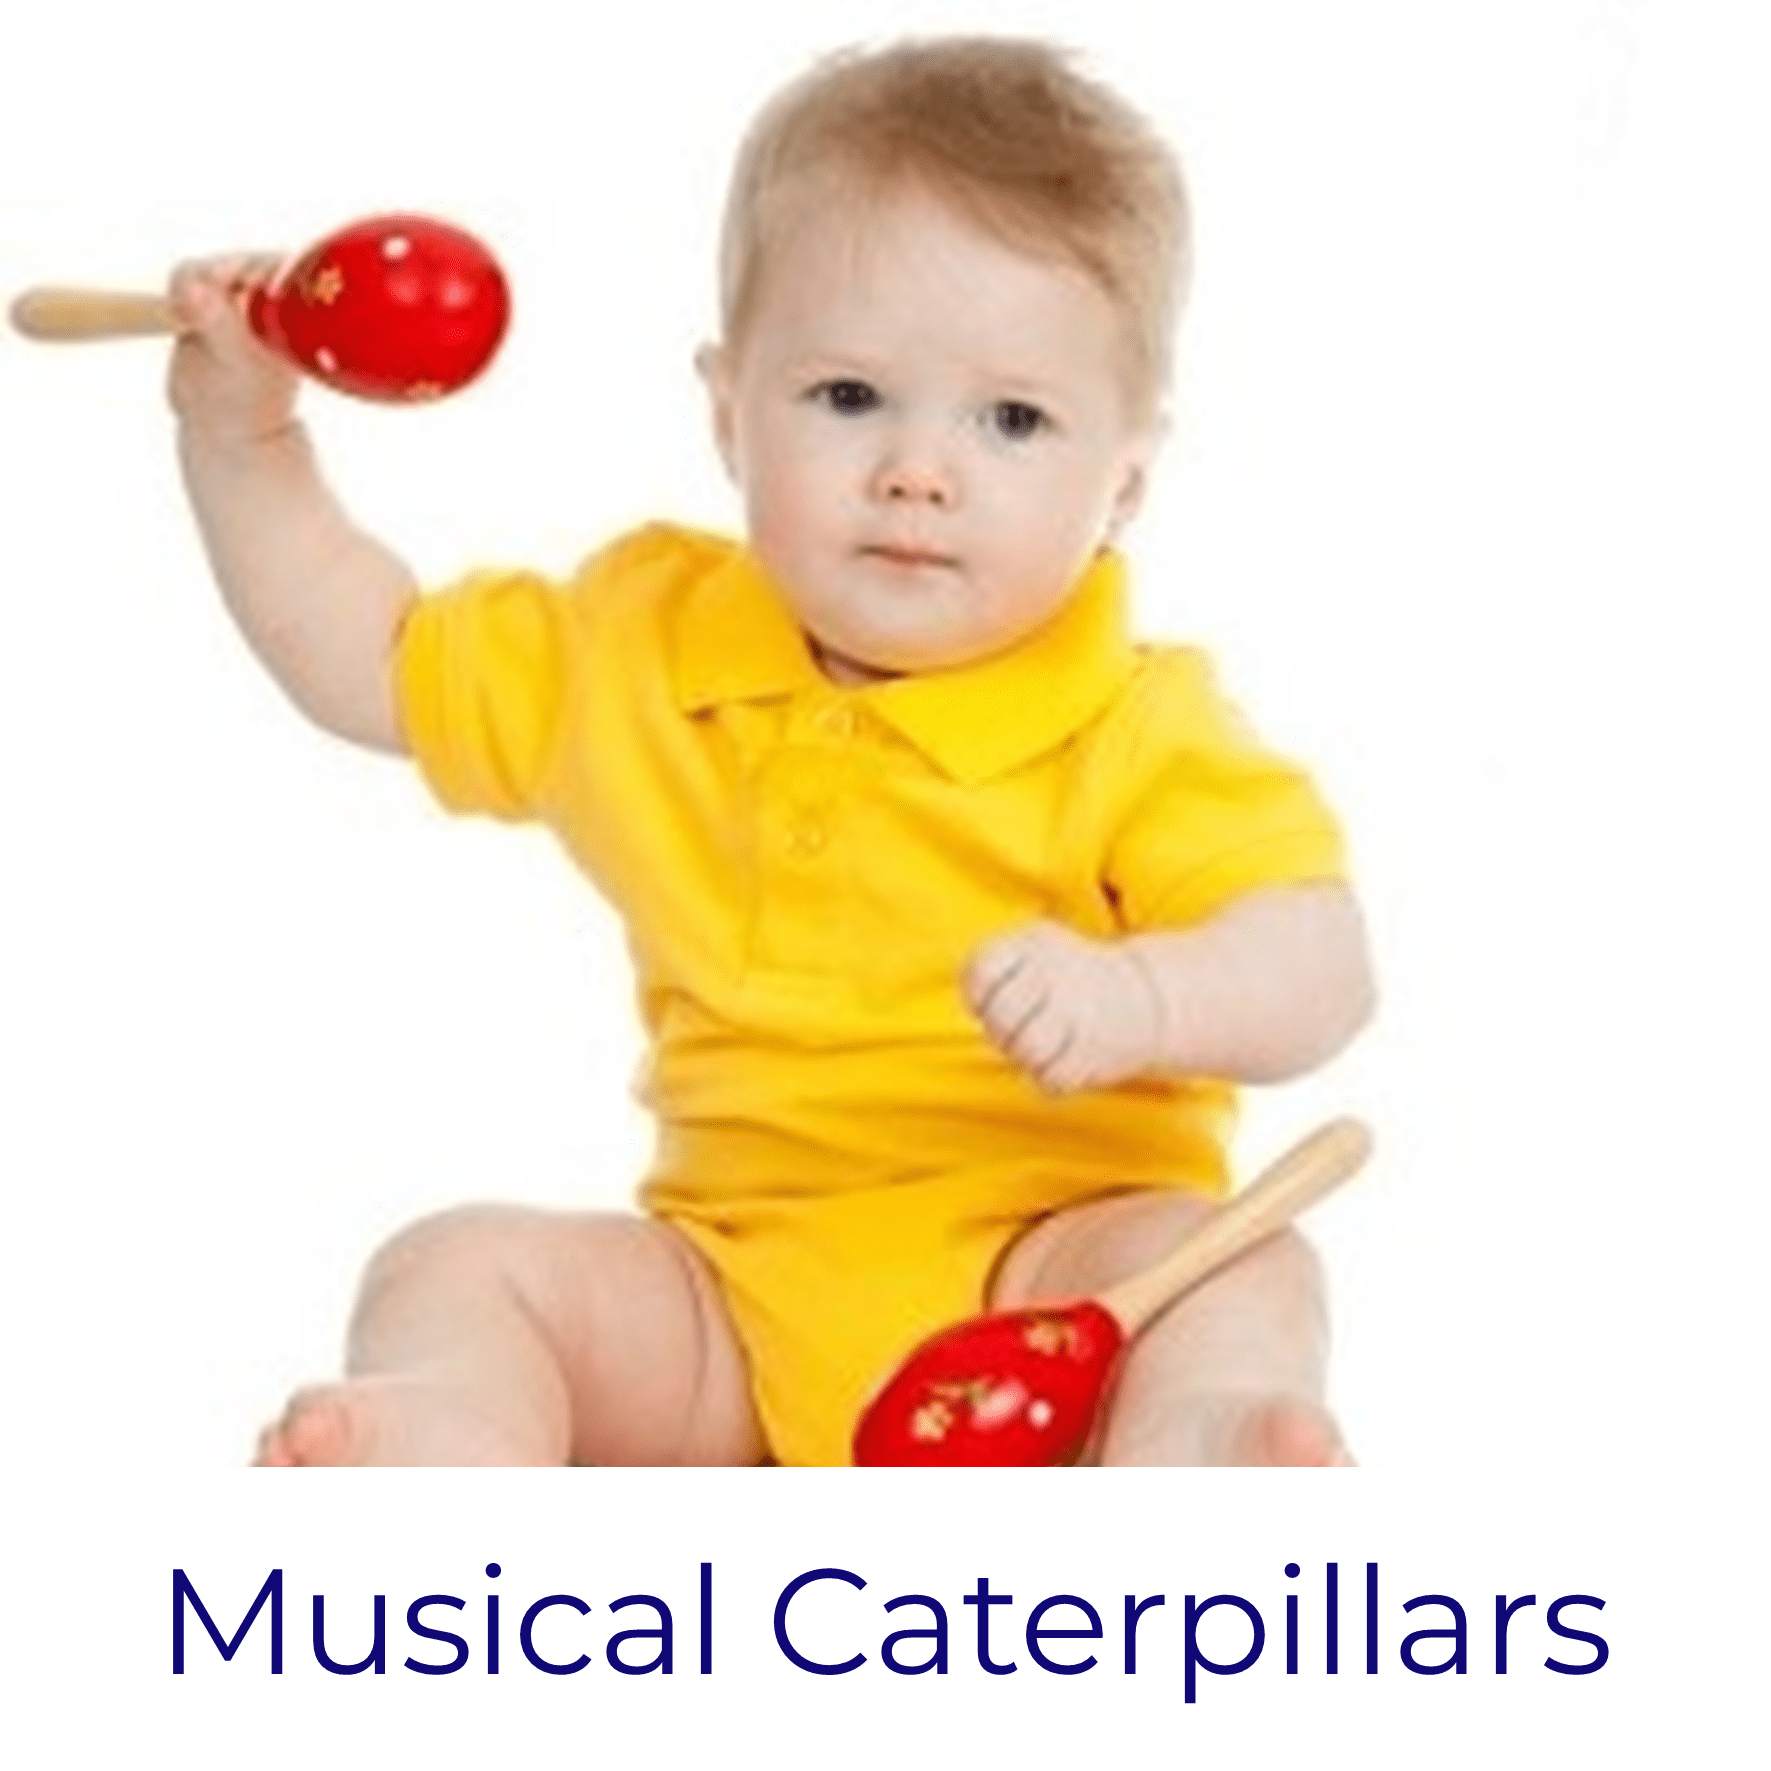 Musical Caterpillars